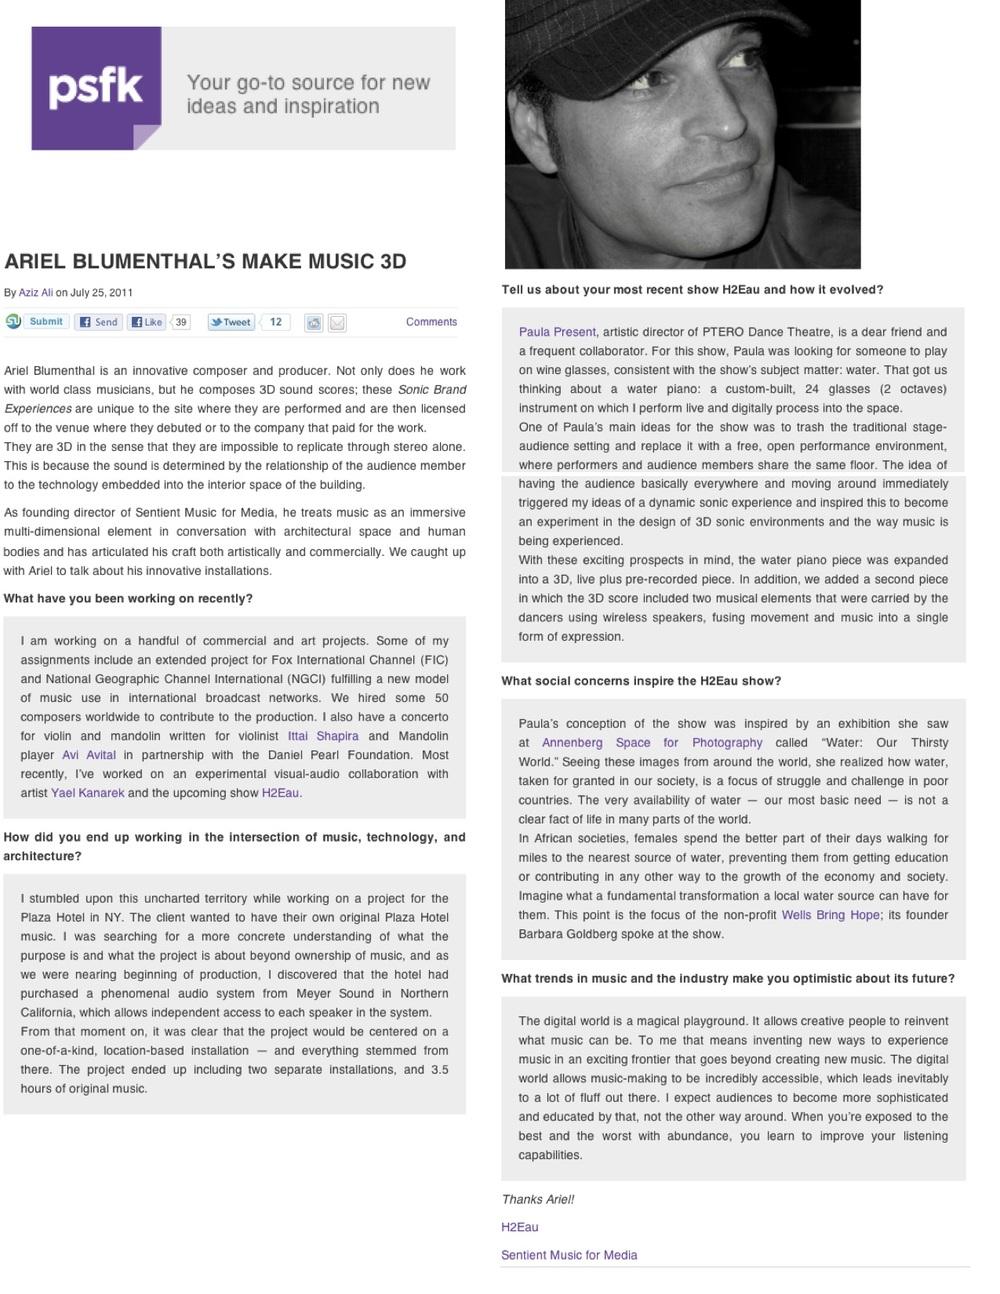 Composer Ariel Blumenthal Interview: 3 dimensional music PSFK